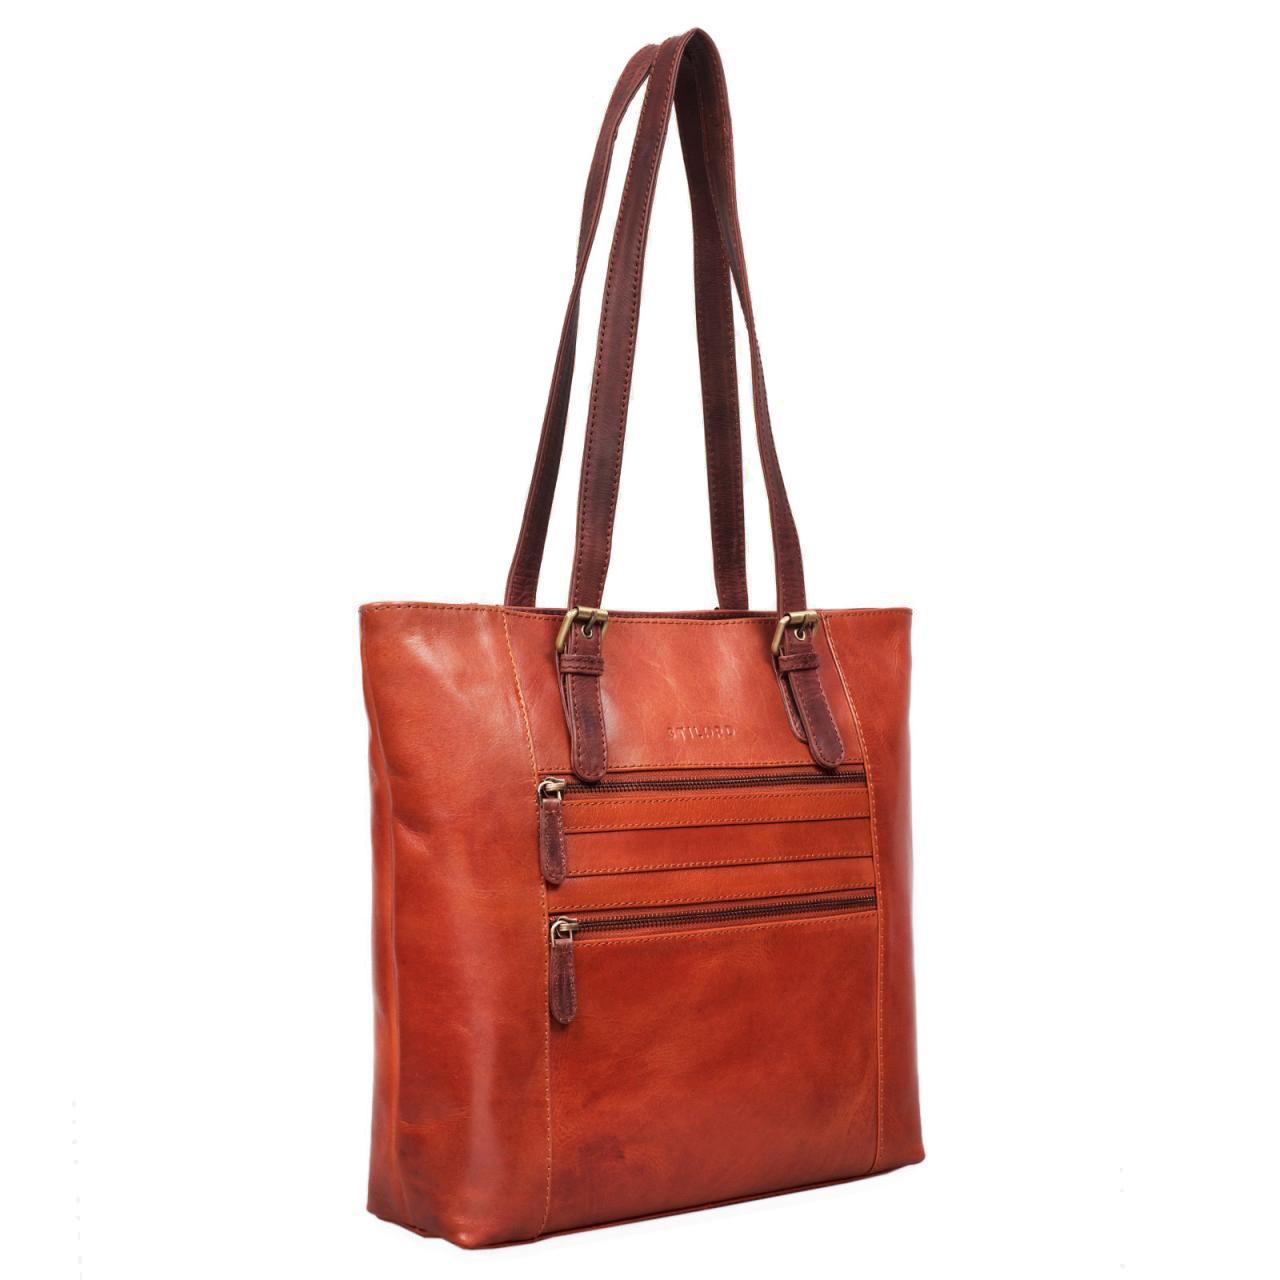 Handtasche aus echtem Leder Vintage